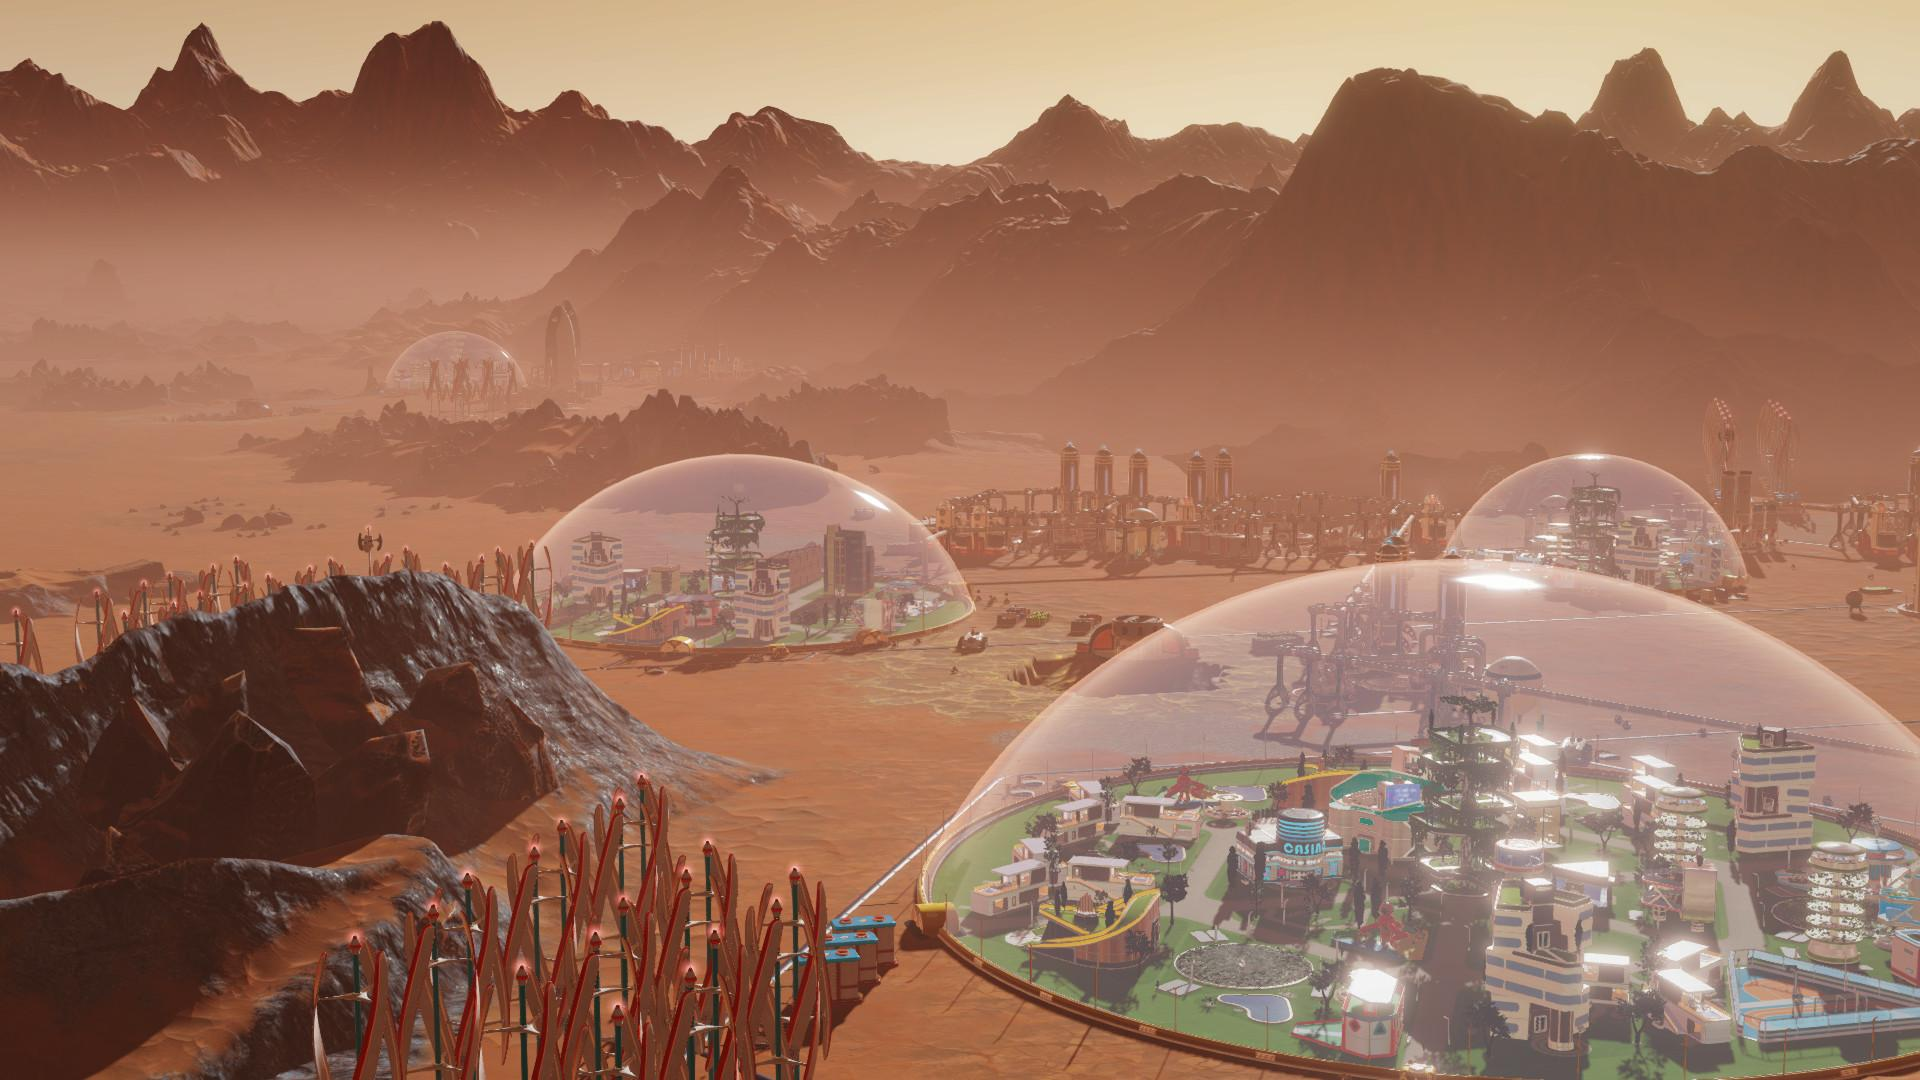 Epic喜加一:建造火星城市《SurvivingMars》_游戏